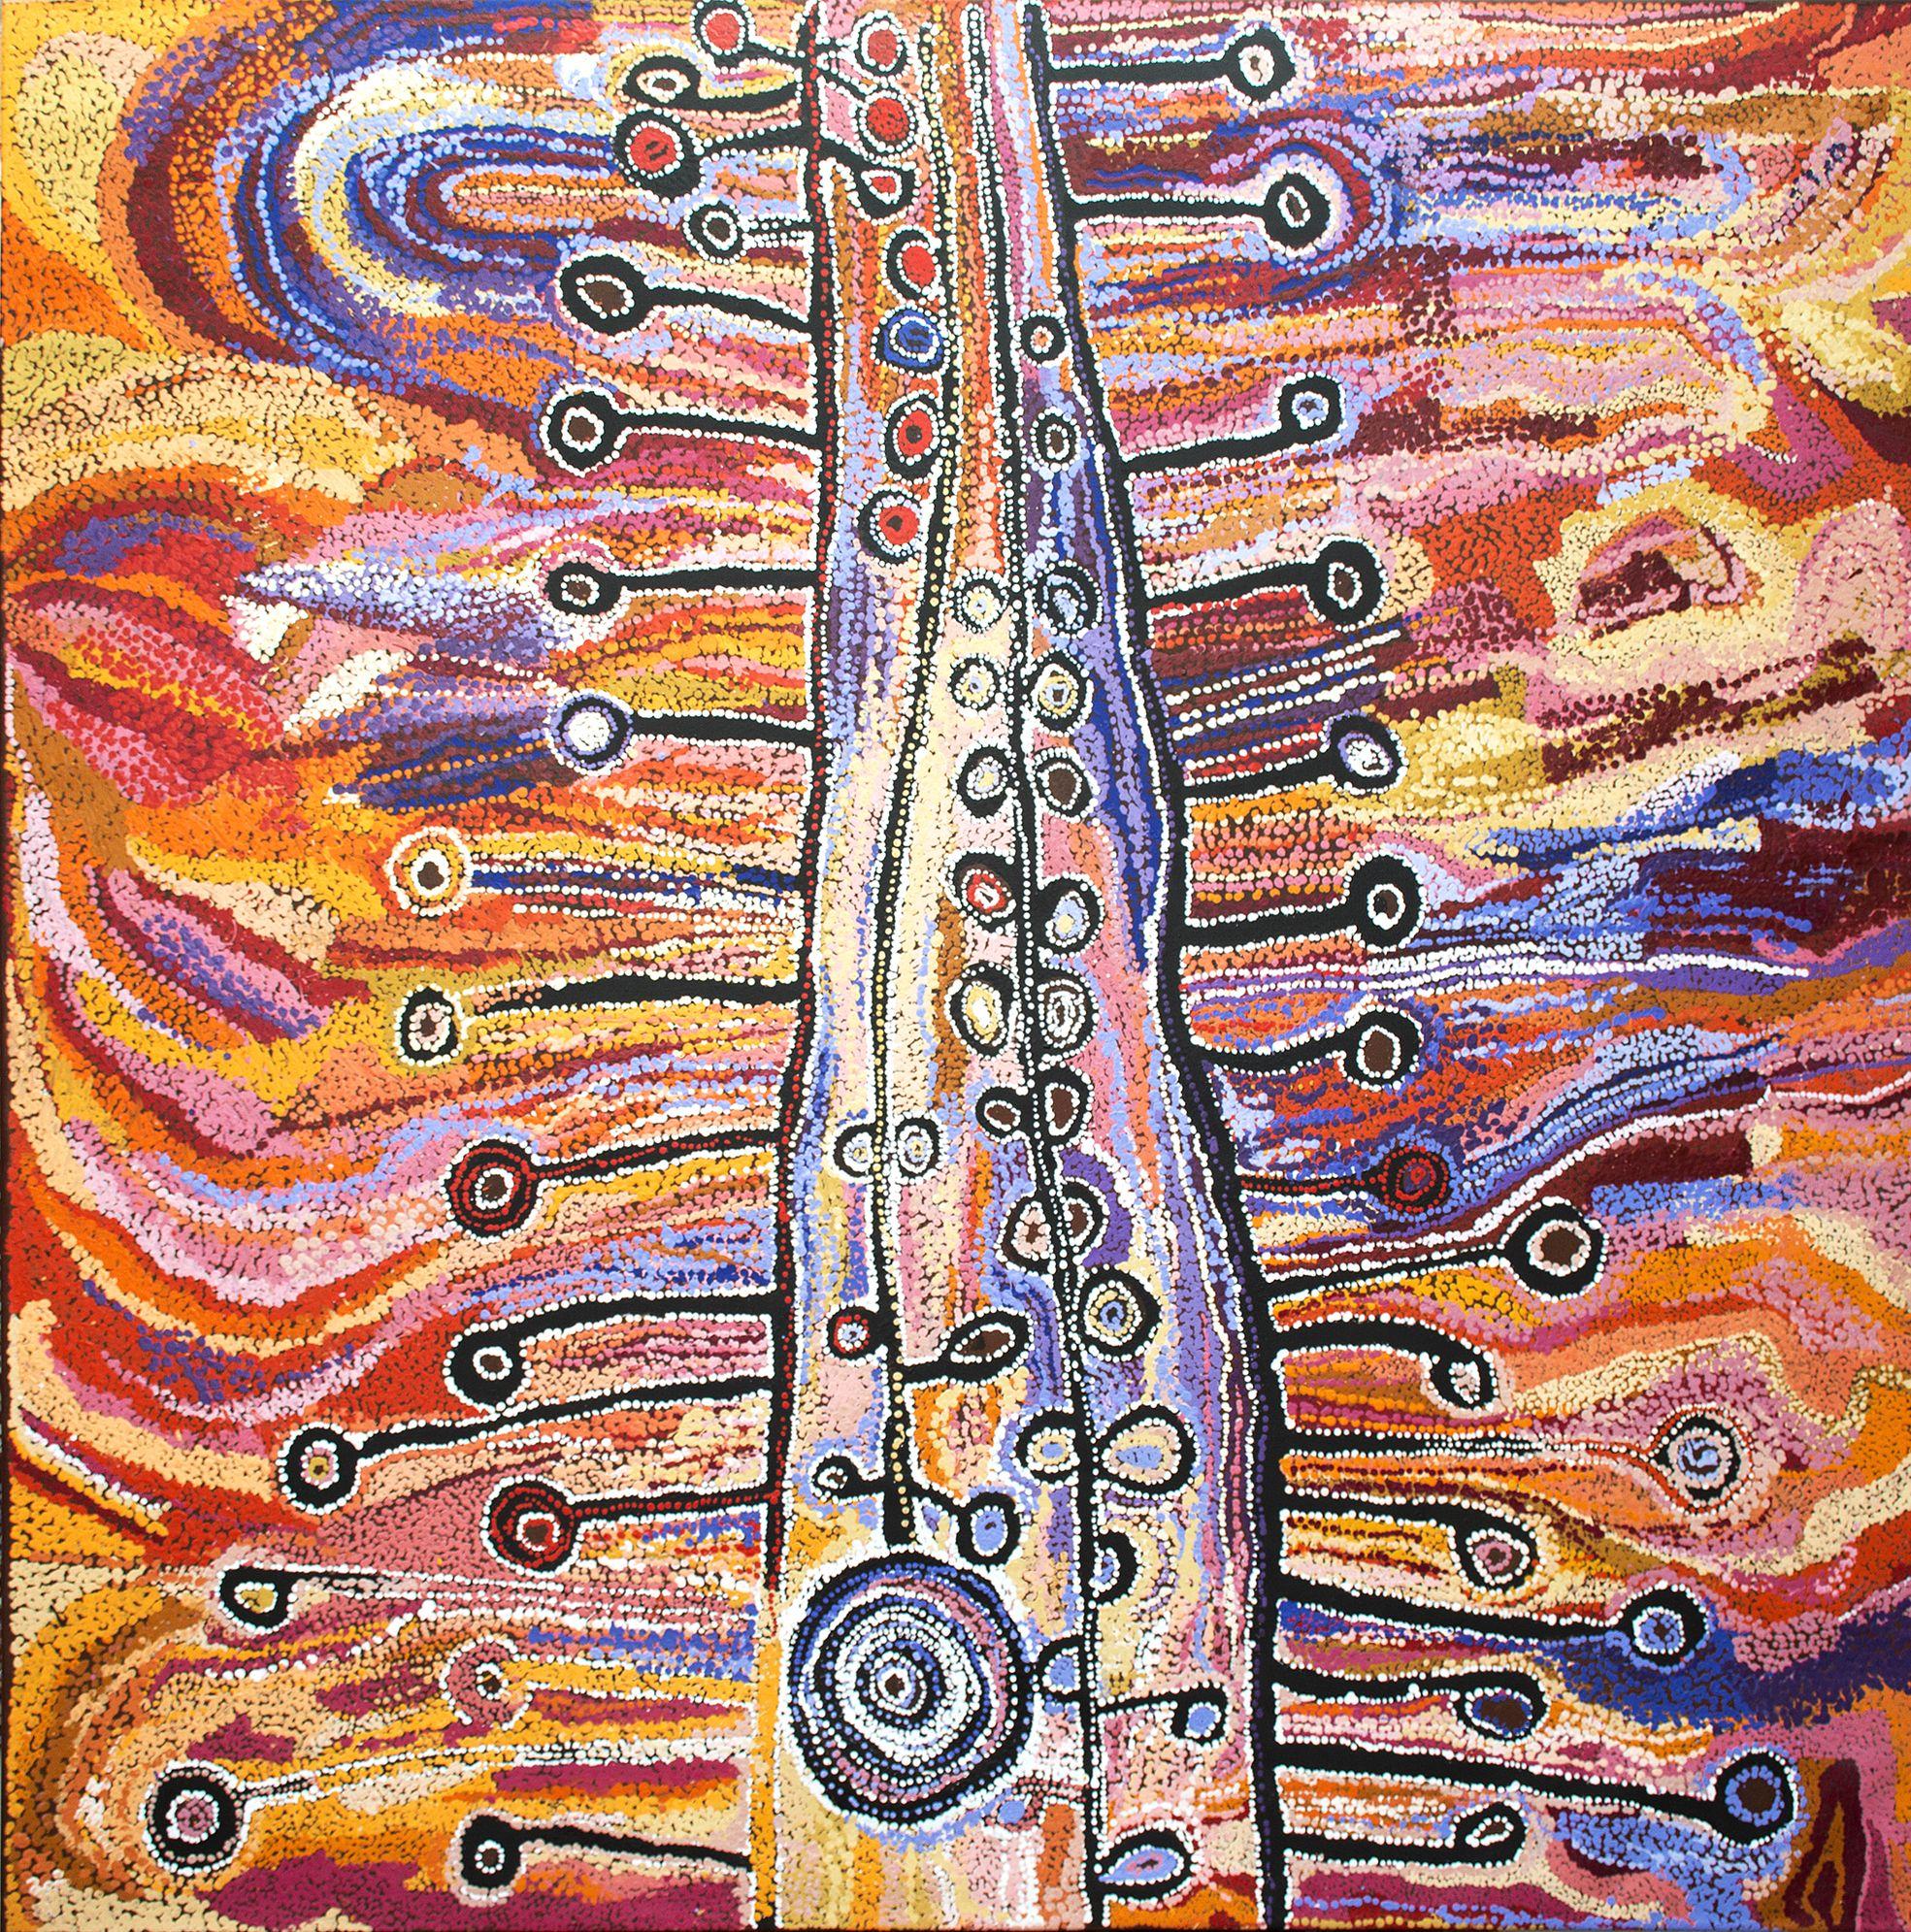 Œuvre de l'artiste Aborigène Wawiriya Burton (1925). Titre : Ngayuku Mamaku Ngura- My Father's Country. Format : 198 x 197 cm. © Aboriginal Signature • Estrangin gallery, avec l'autorisation des artistes et de Tjala Art Centre.